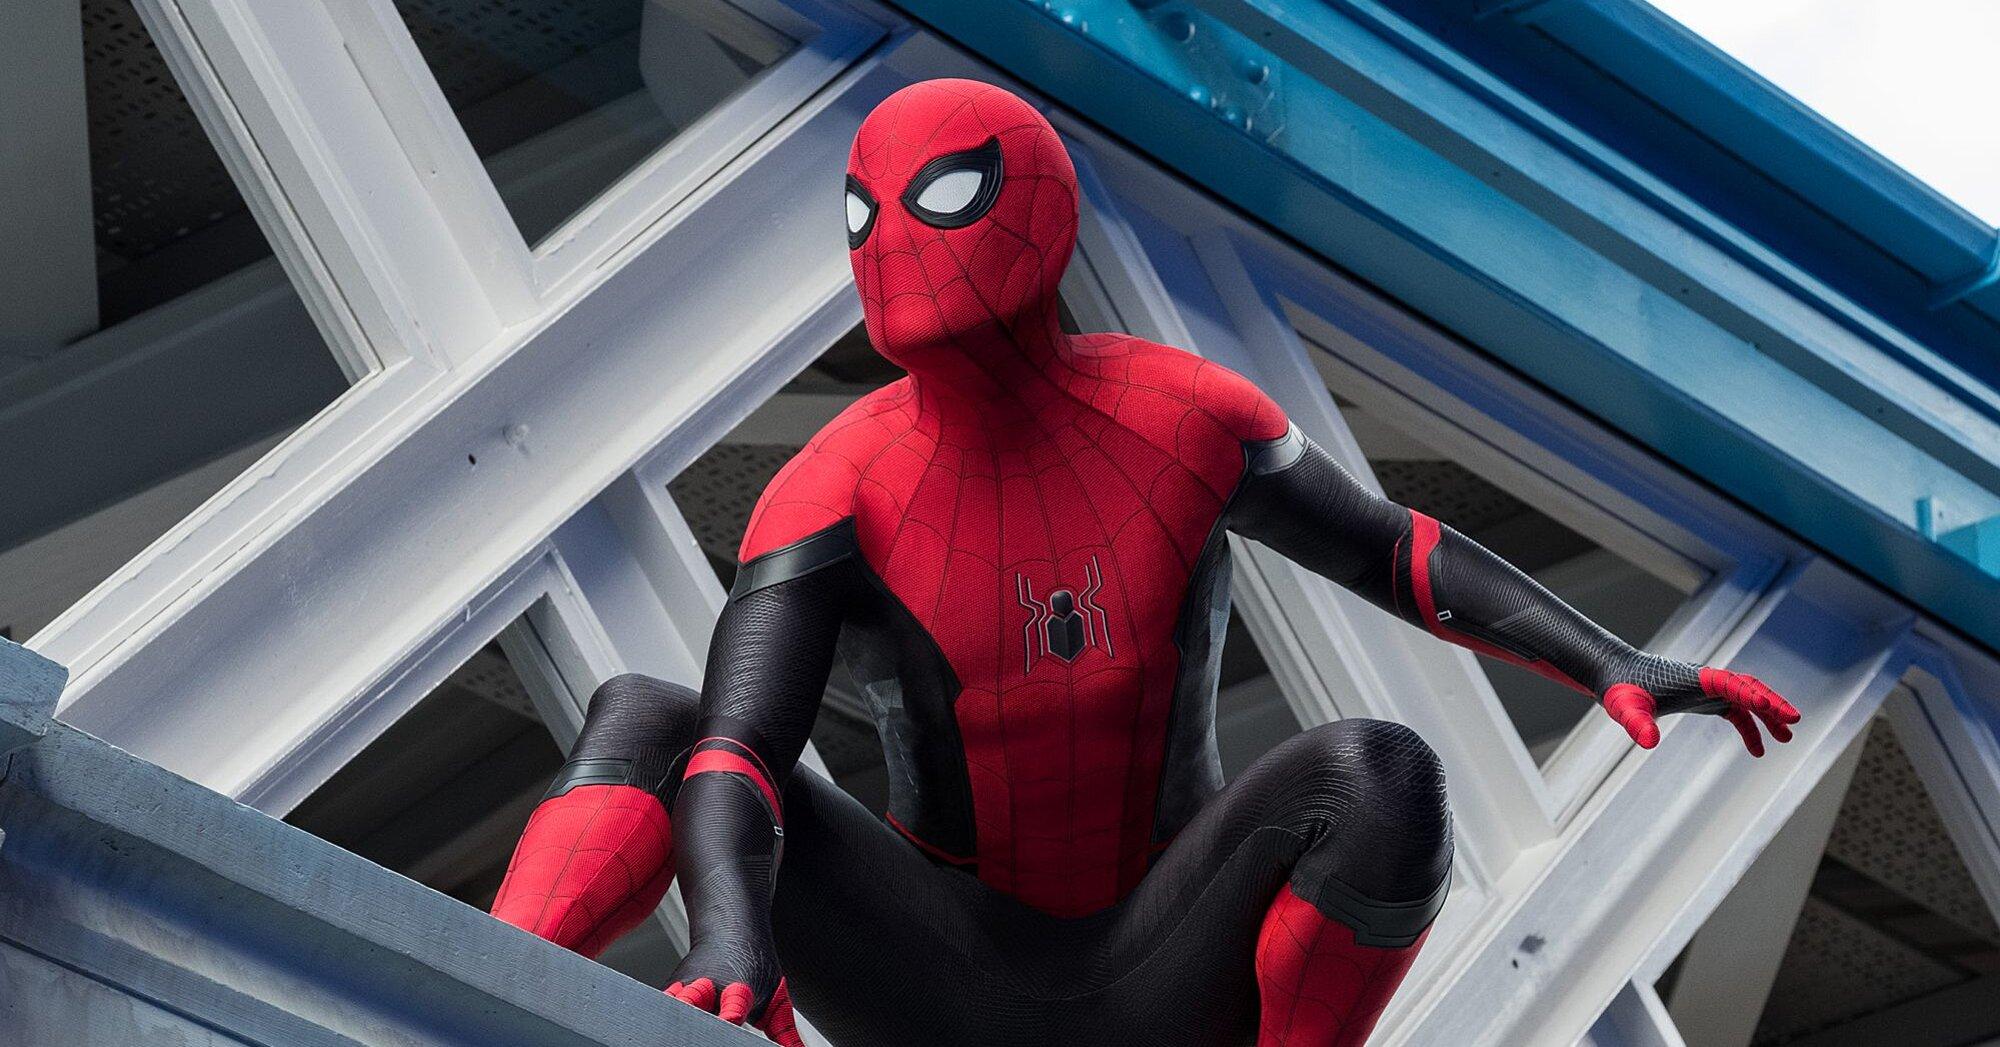 Spider-Man swings again: Marvel, Sony reach deal on next Tom Holland film | EW.com